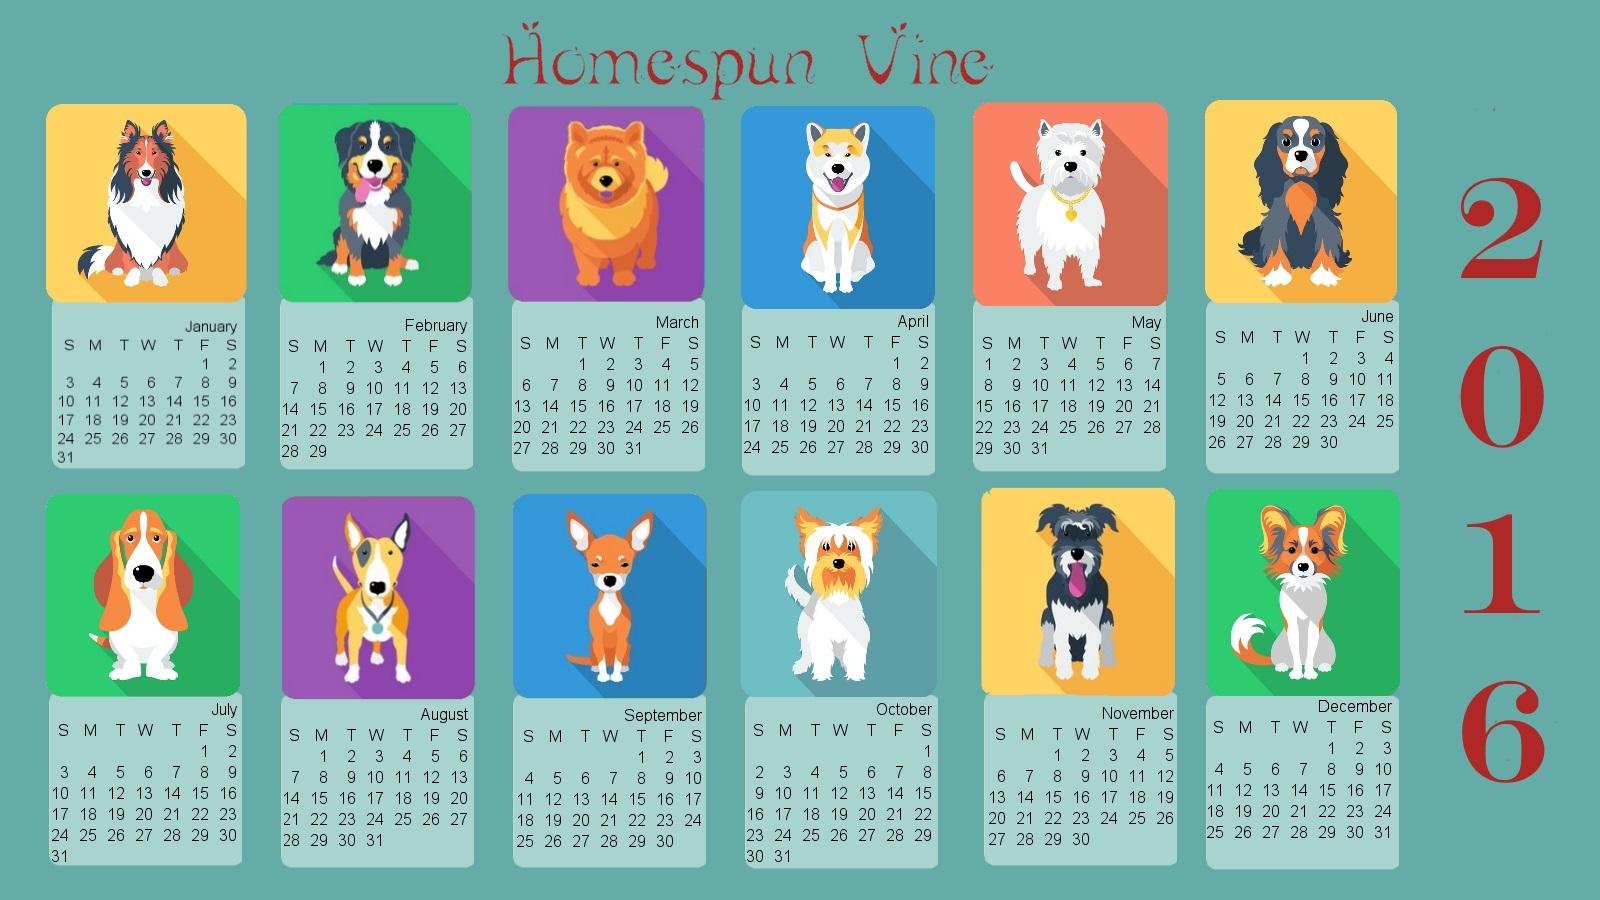 2016 Doggies Desktop Wallpaper With Calendar Homespun Vine 1600x900